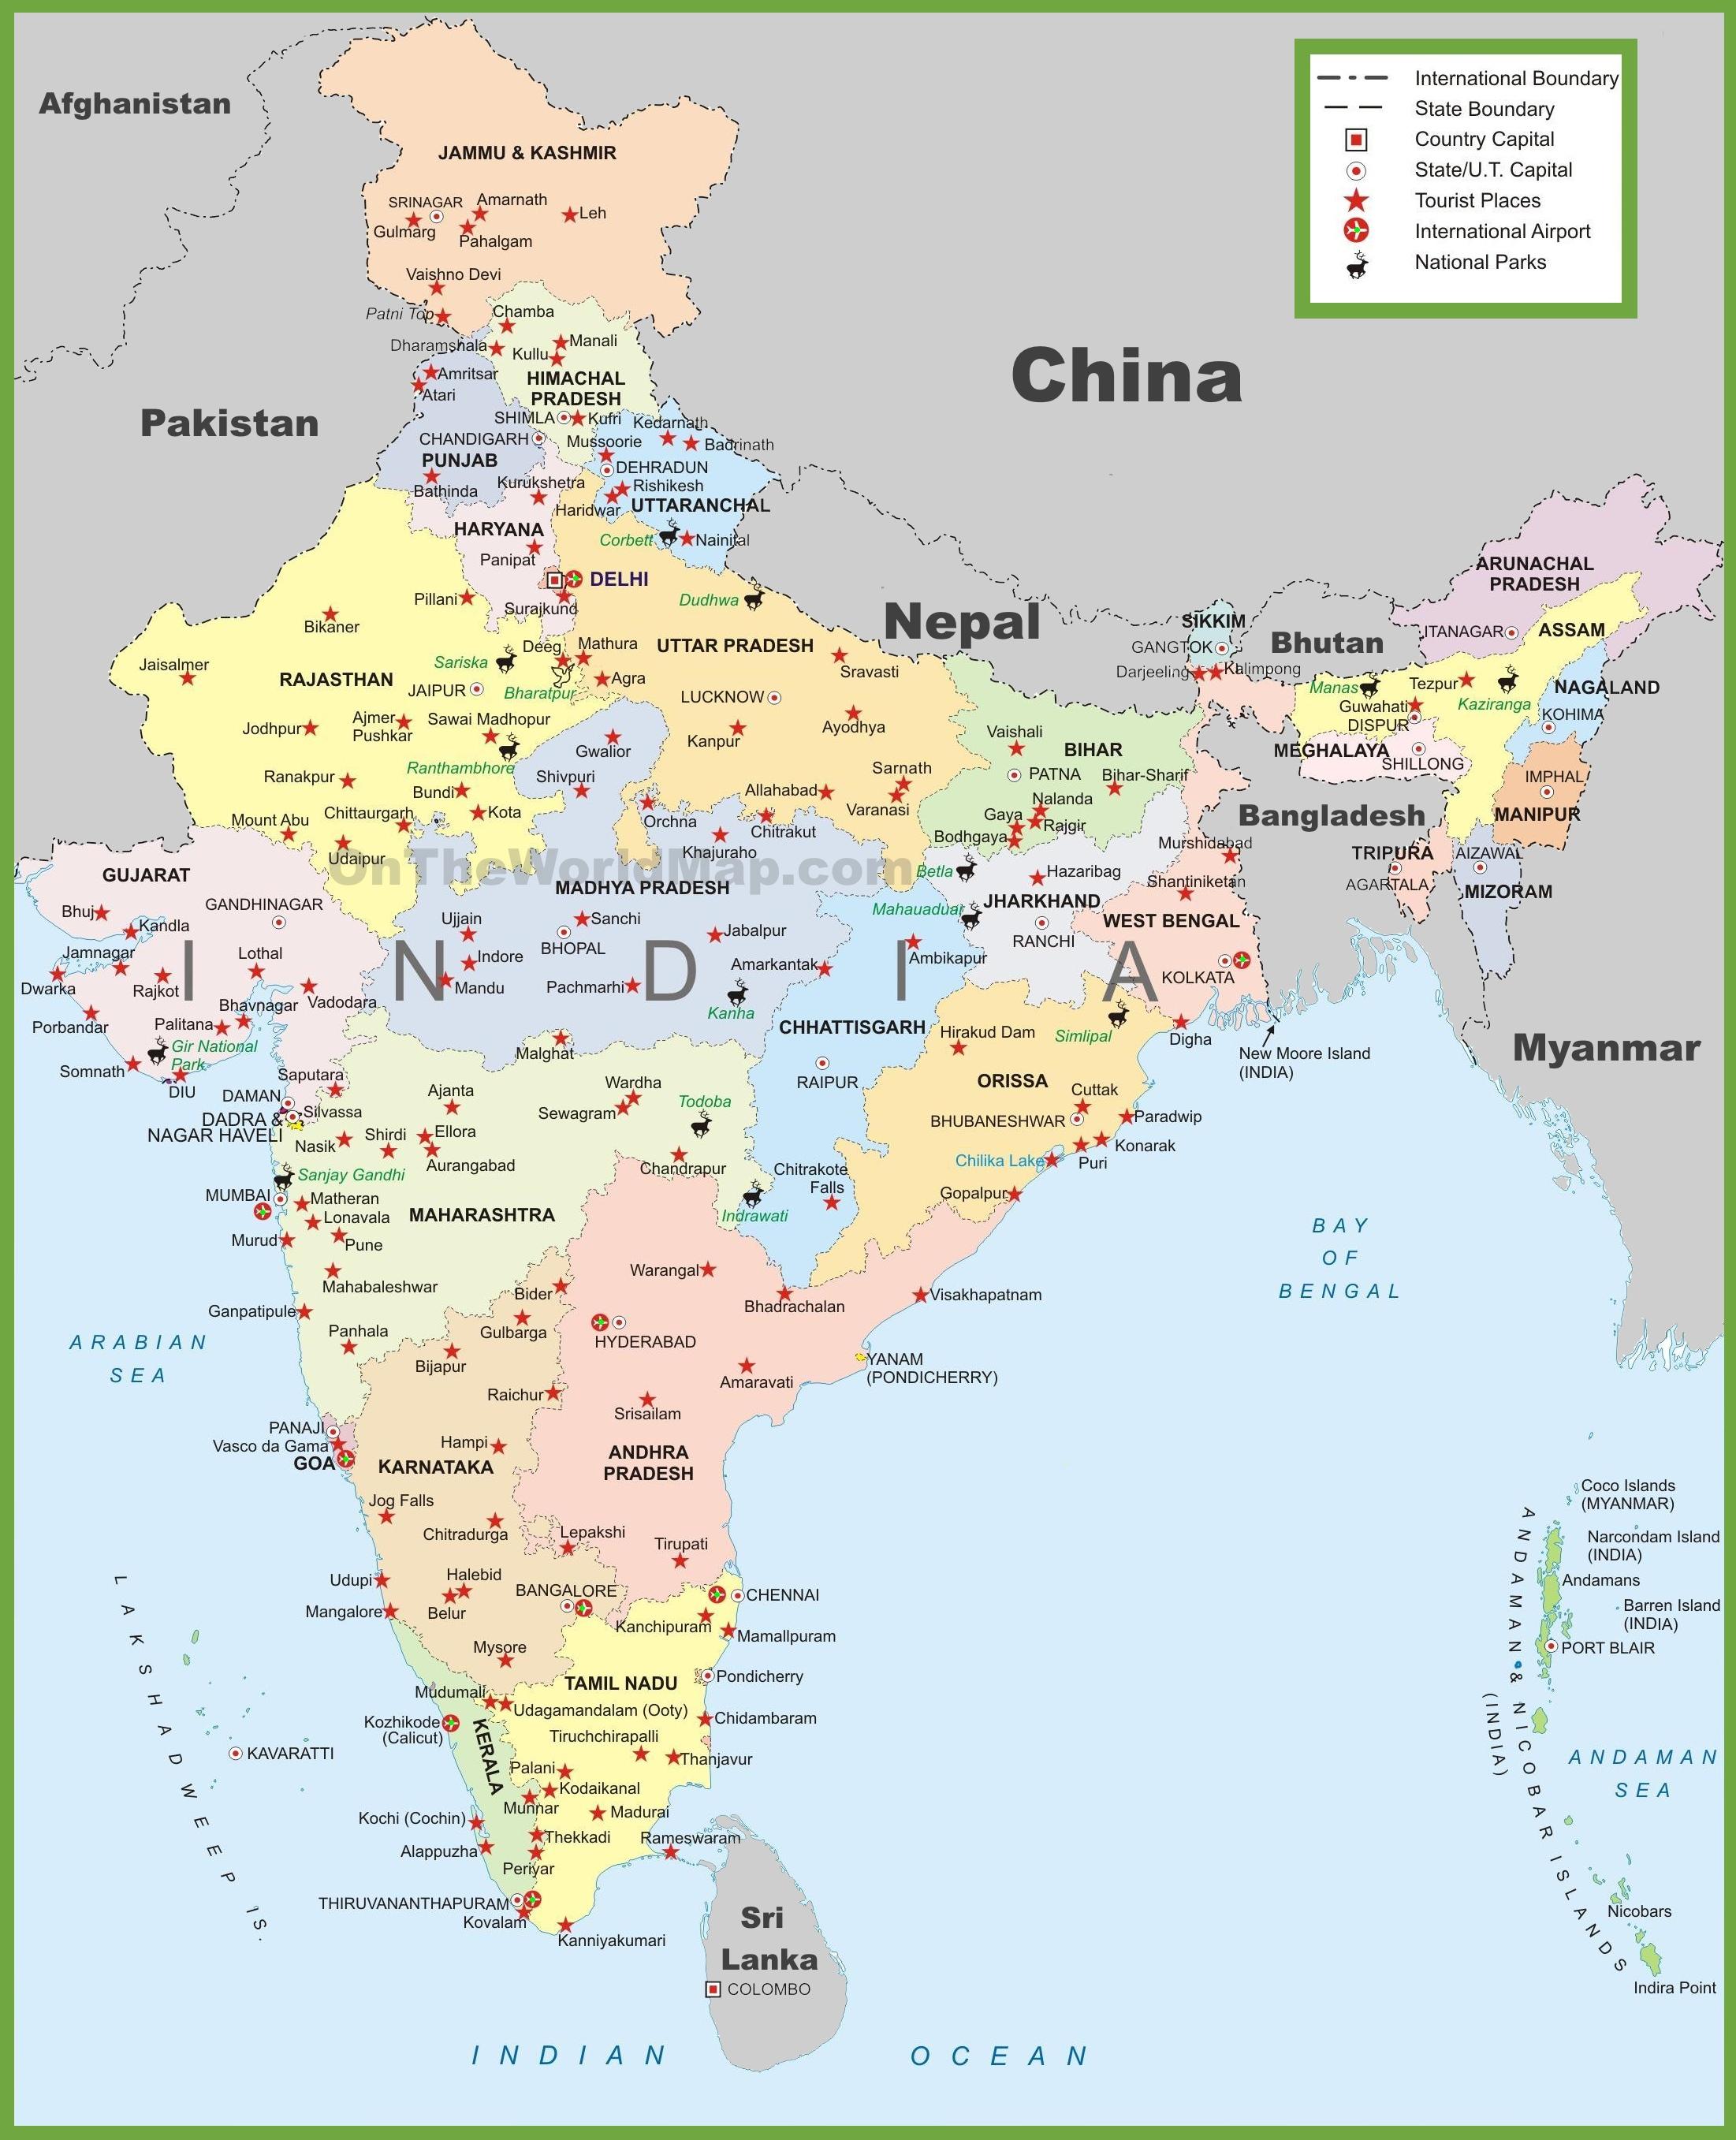 India Maps | Maps of India